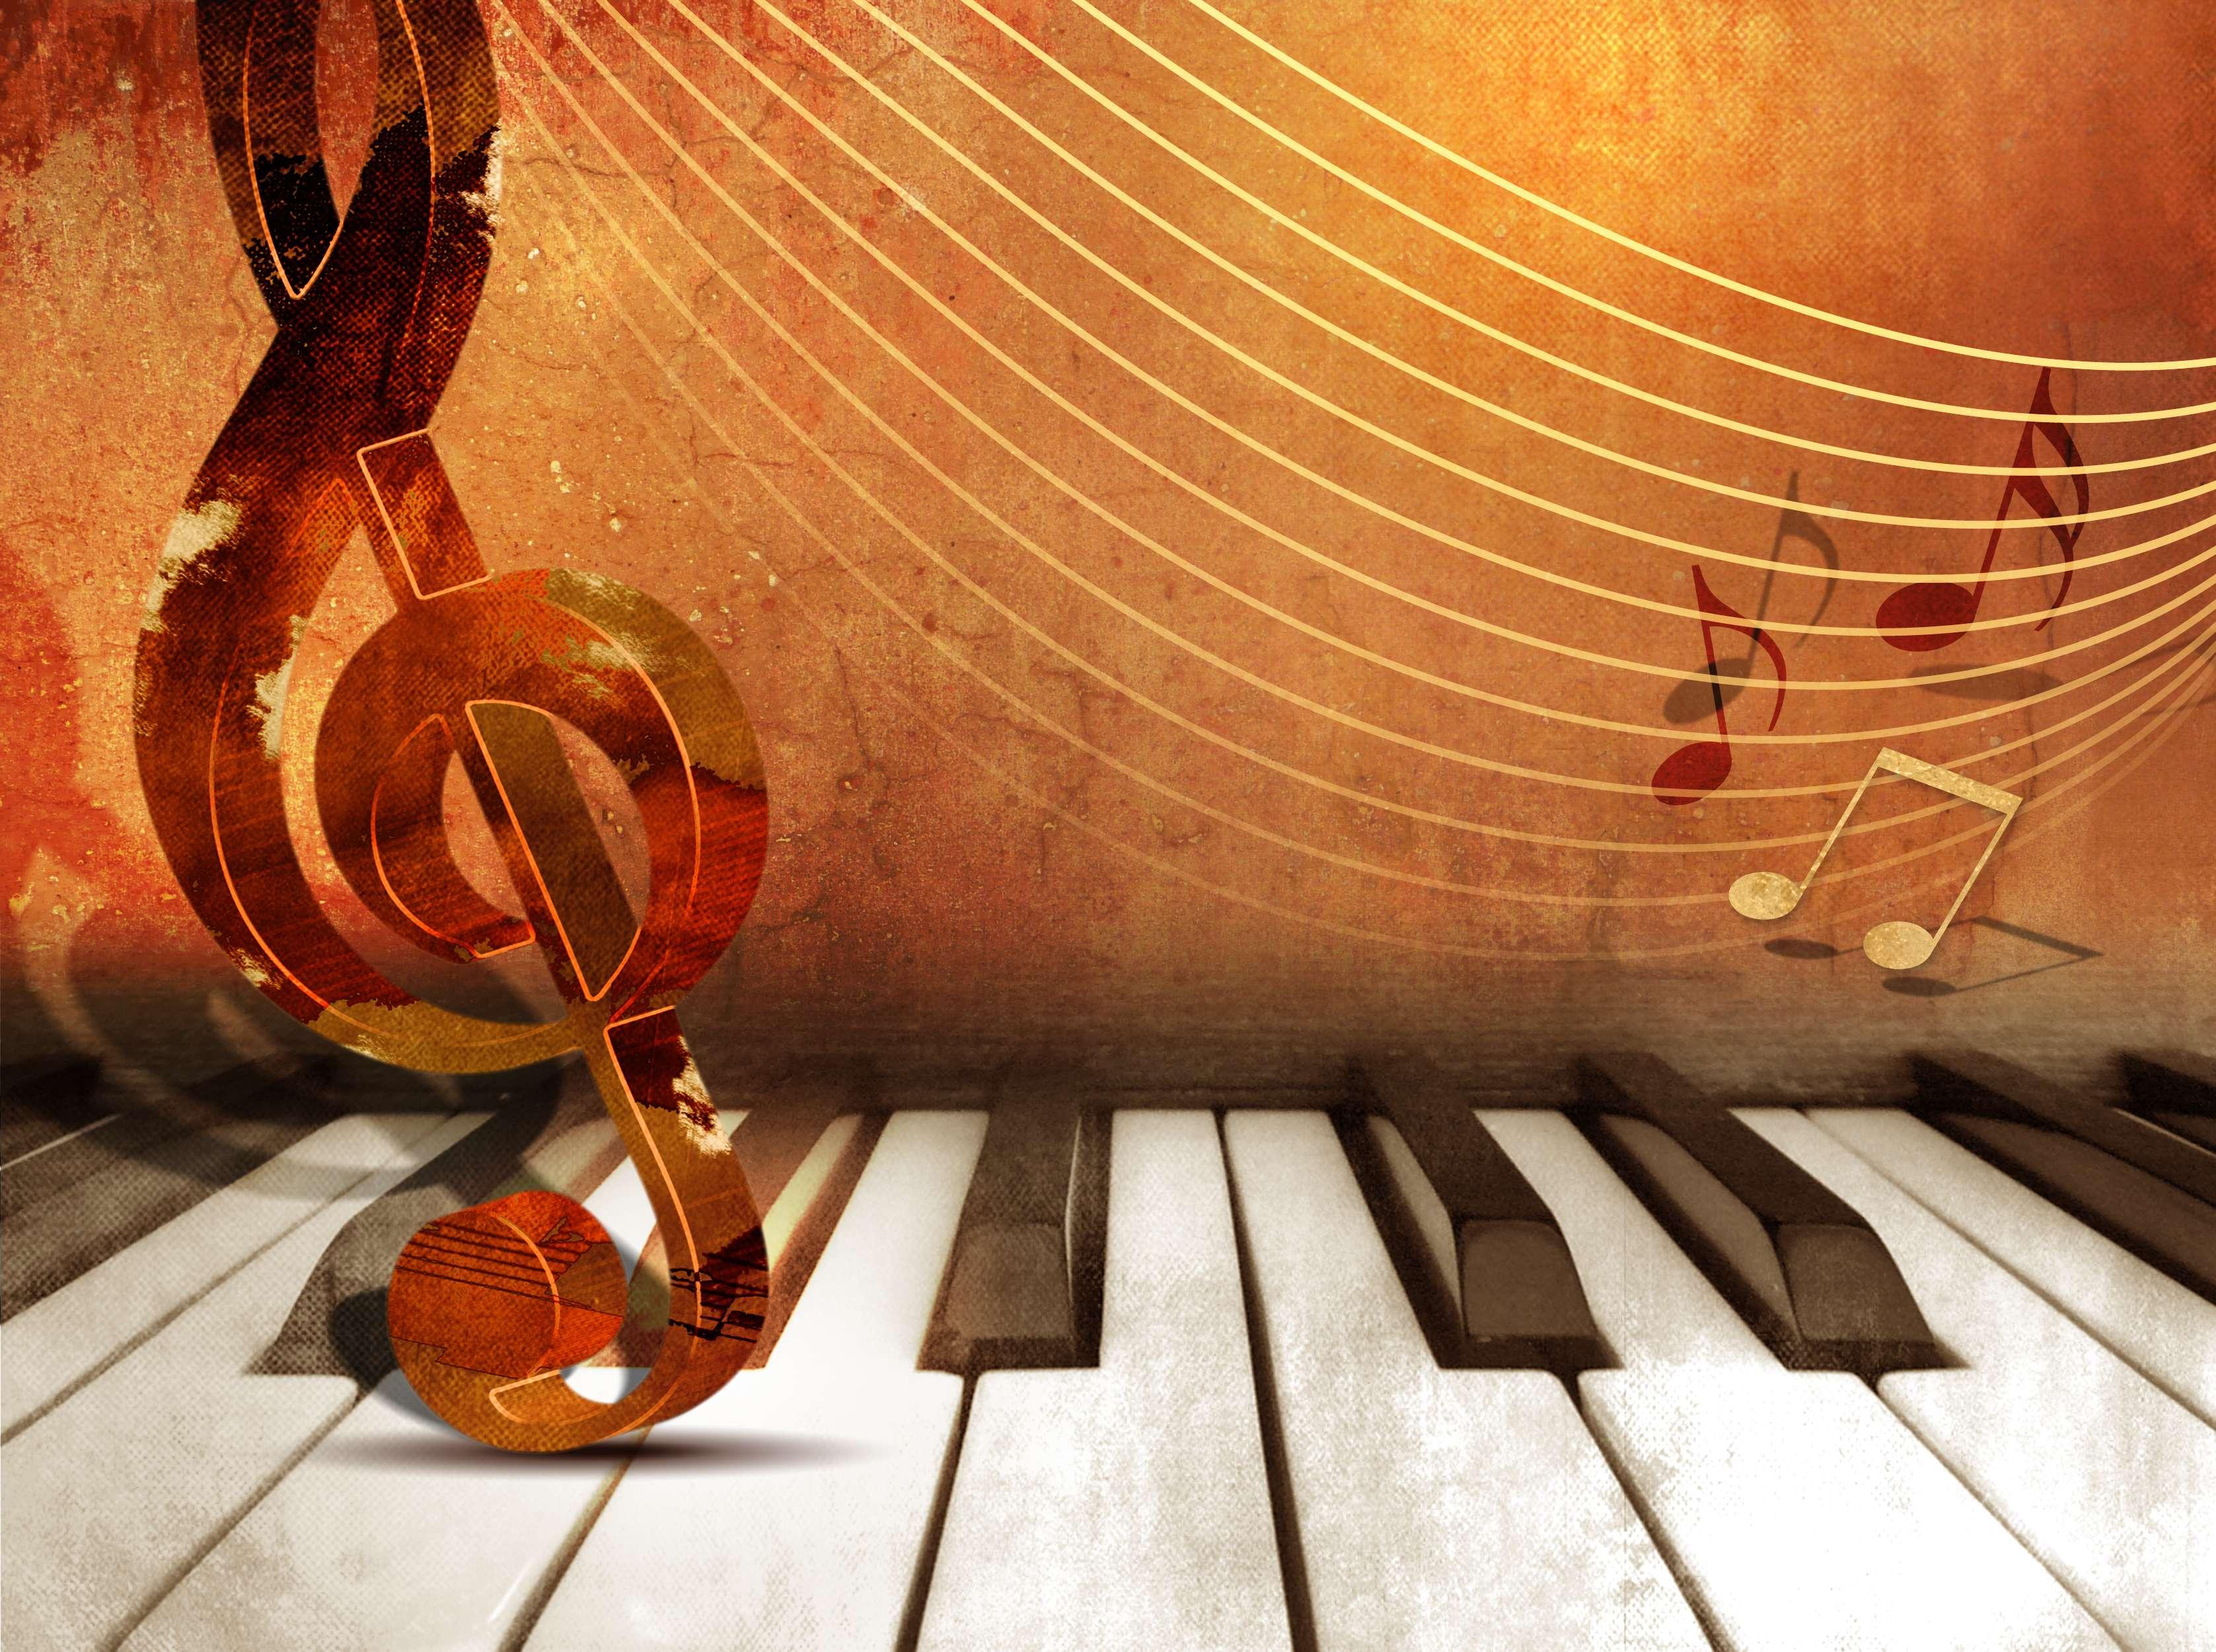 piano music background notes keys backgrounds concert arts fall band fine milwaukee bigstock quartet returns